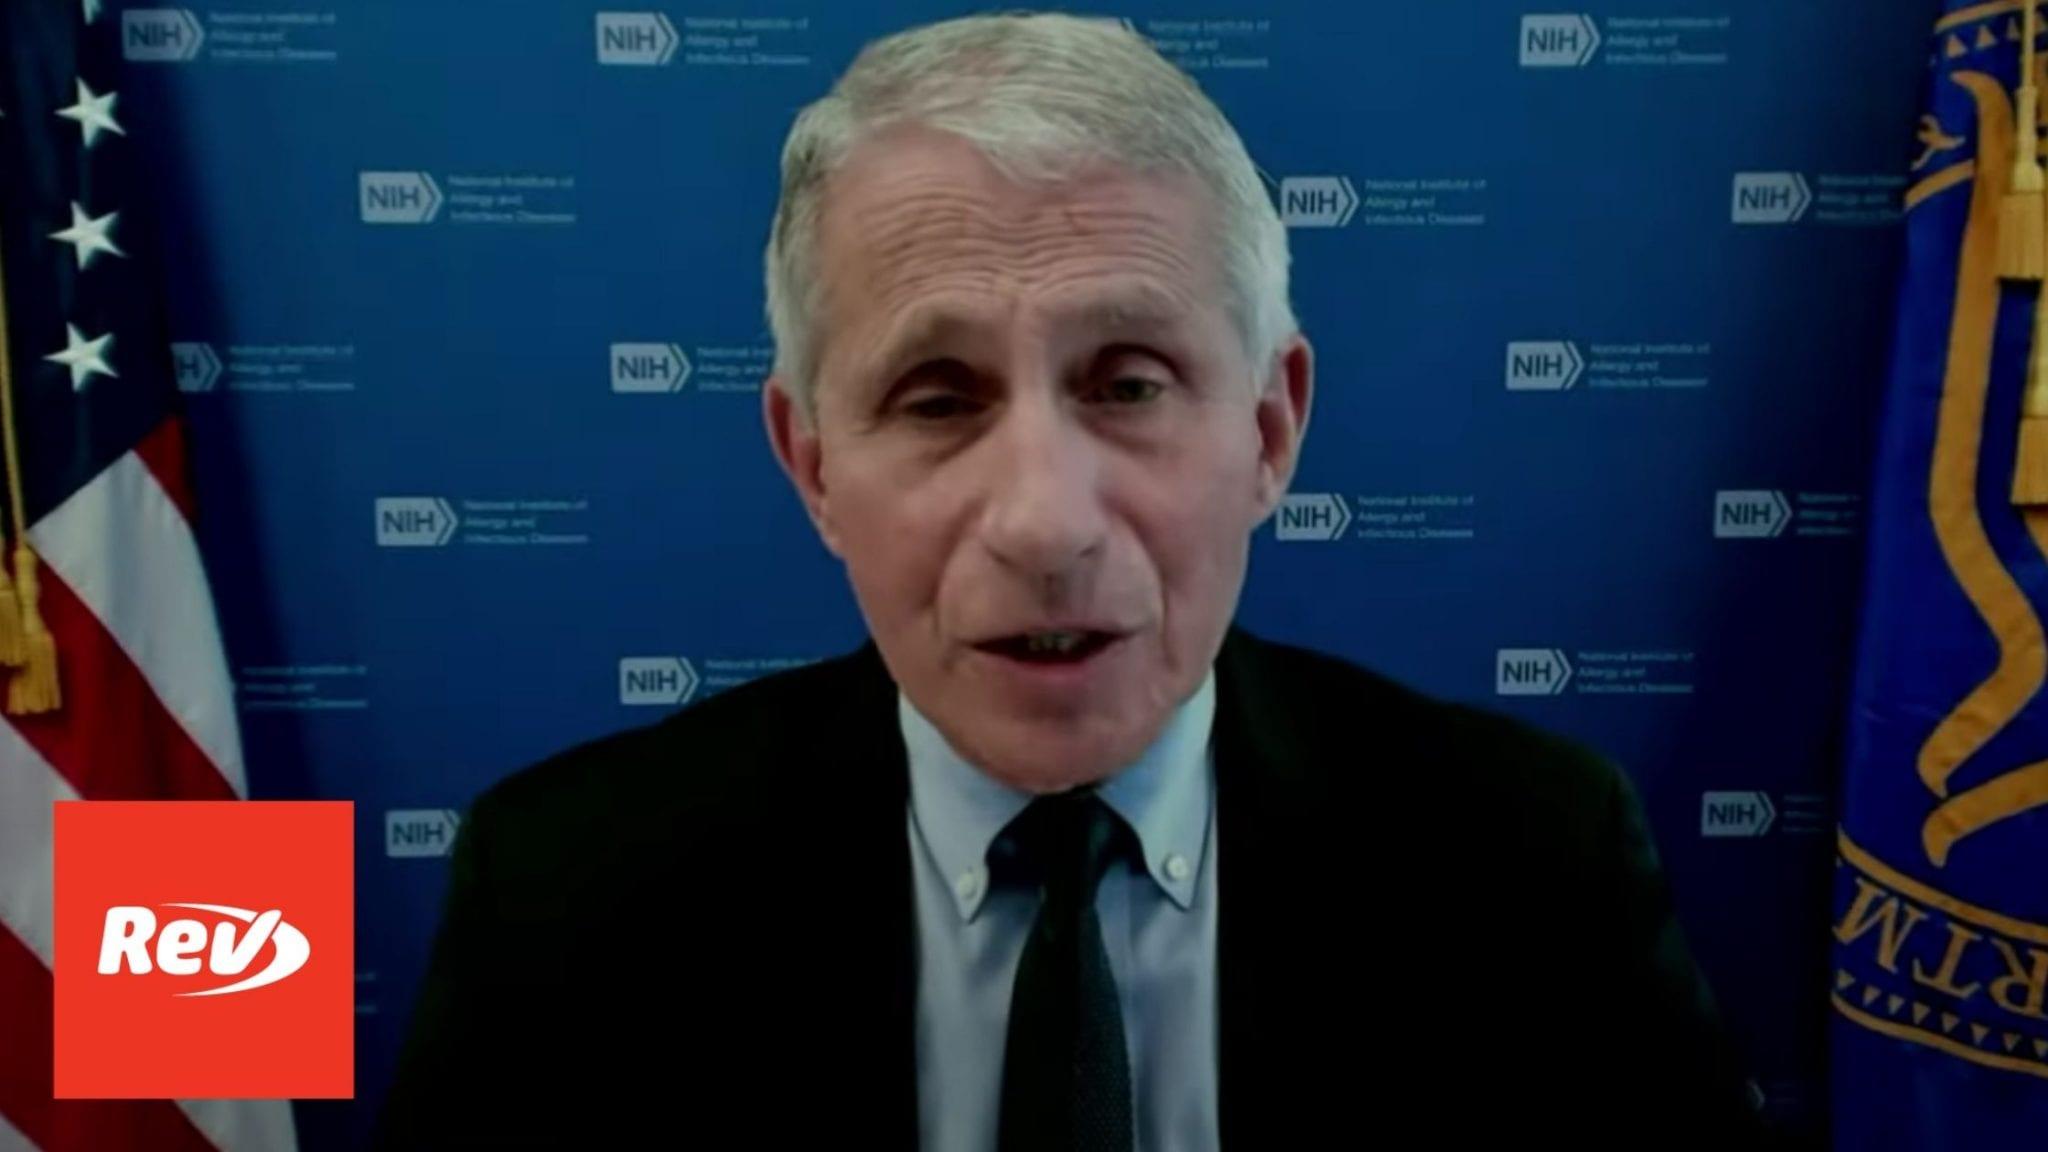 White House COVID-19 Task Force, Dr. Fauci Press Conference Transcript June 8